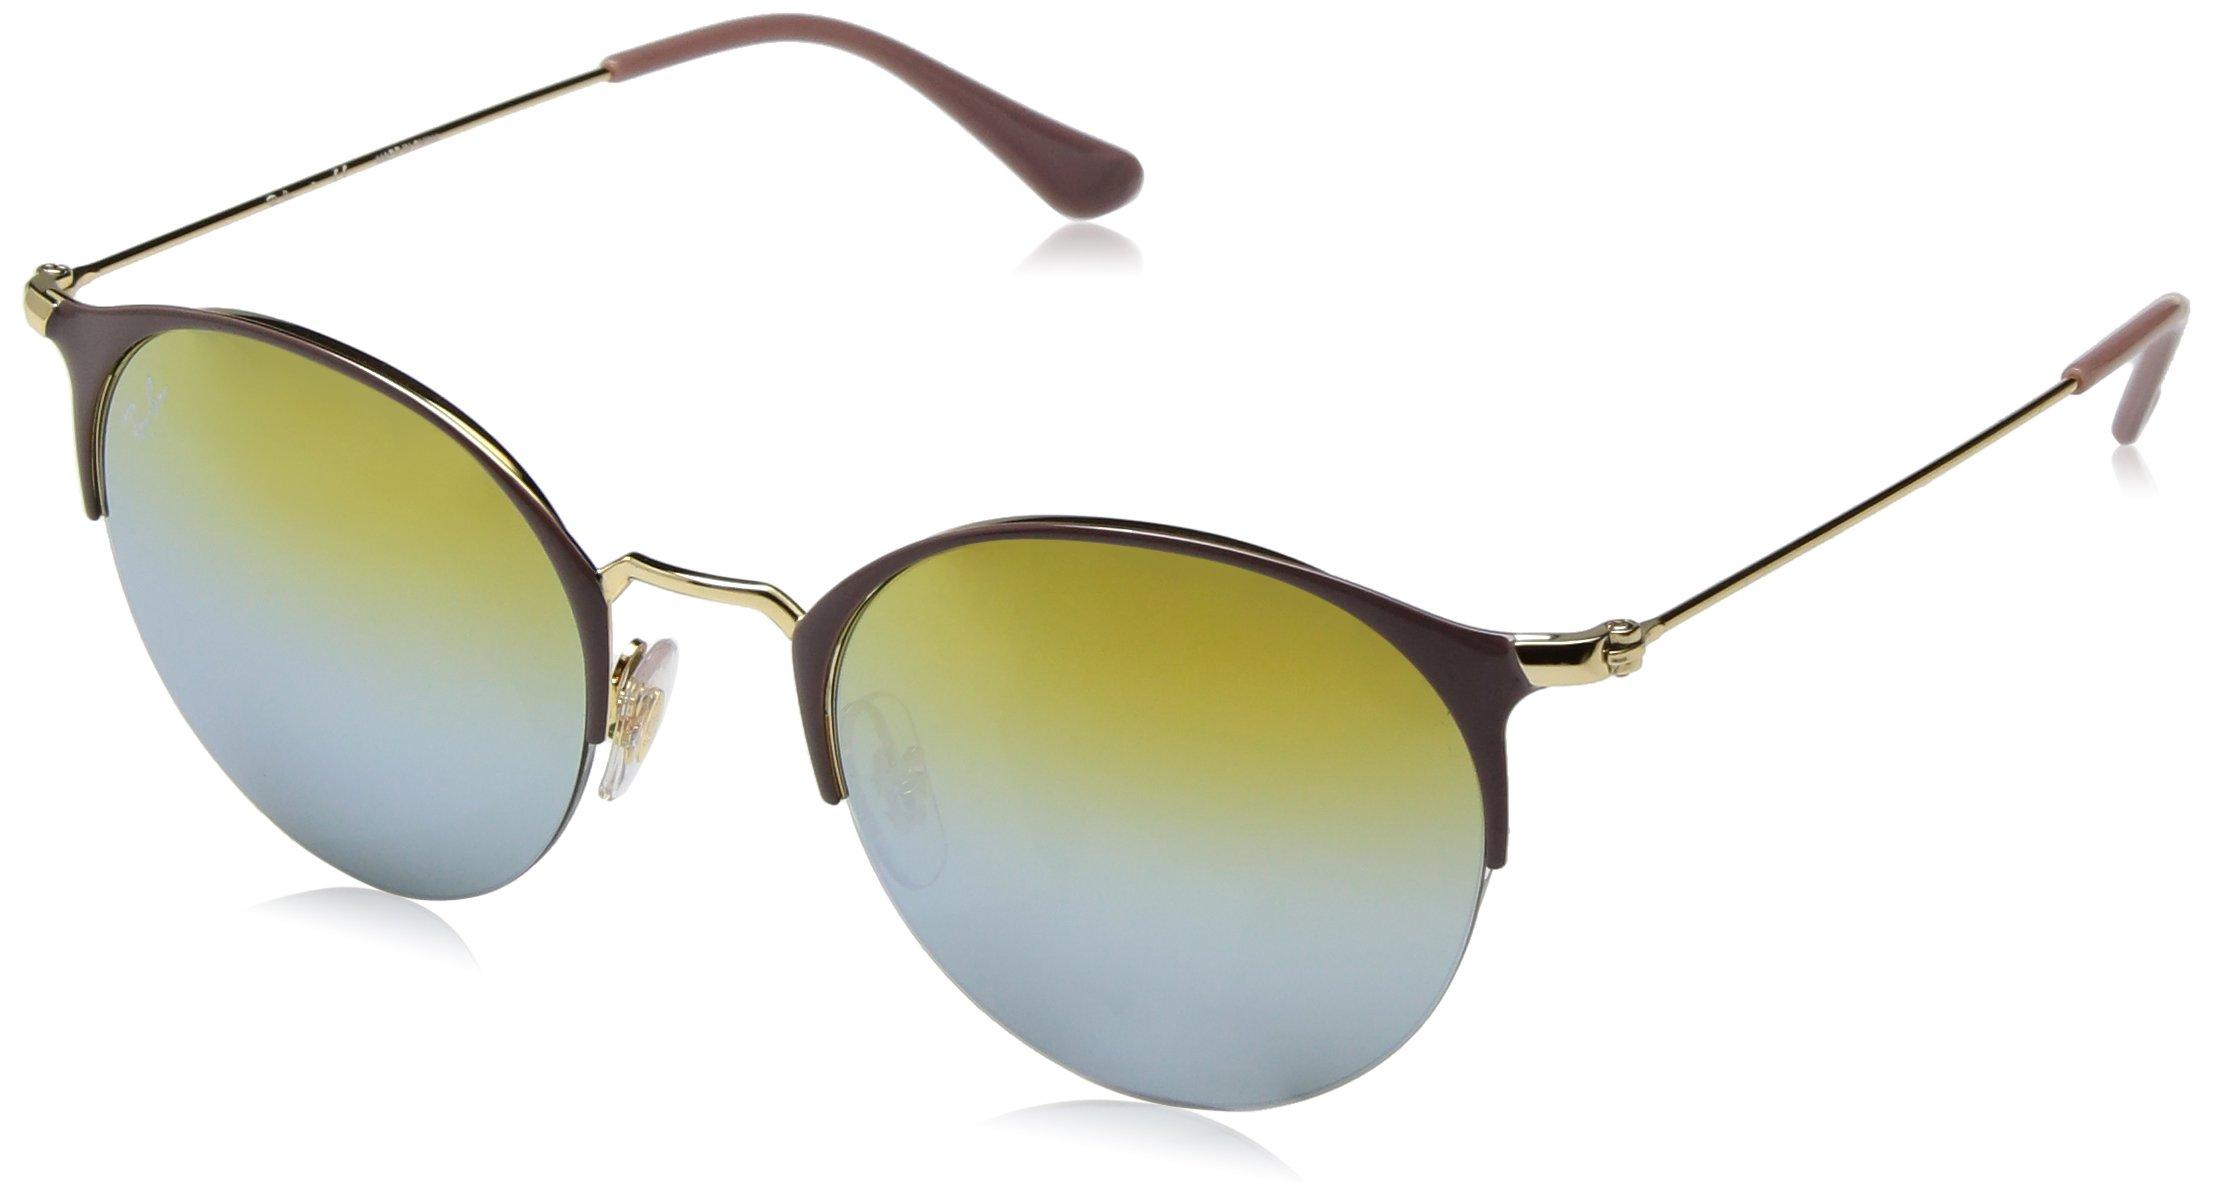 Ray-Ban Metal Unisex Non-Polarized Iridium Round Sunglasses, Gold Top Turtle Dove, 50 mm